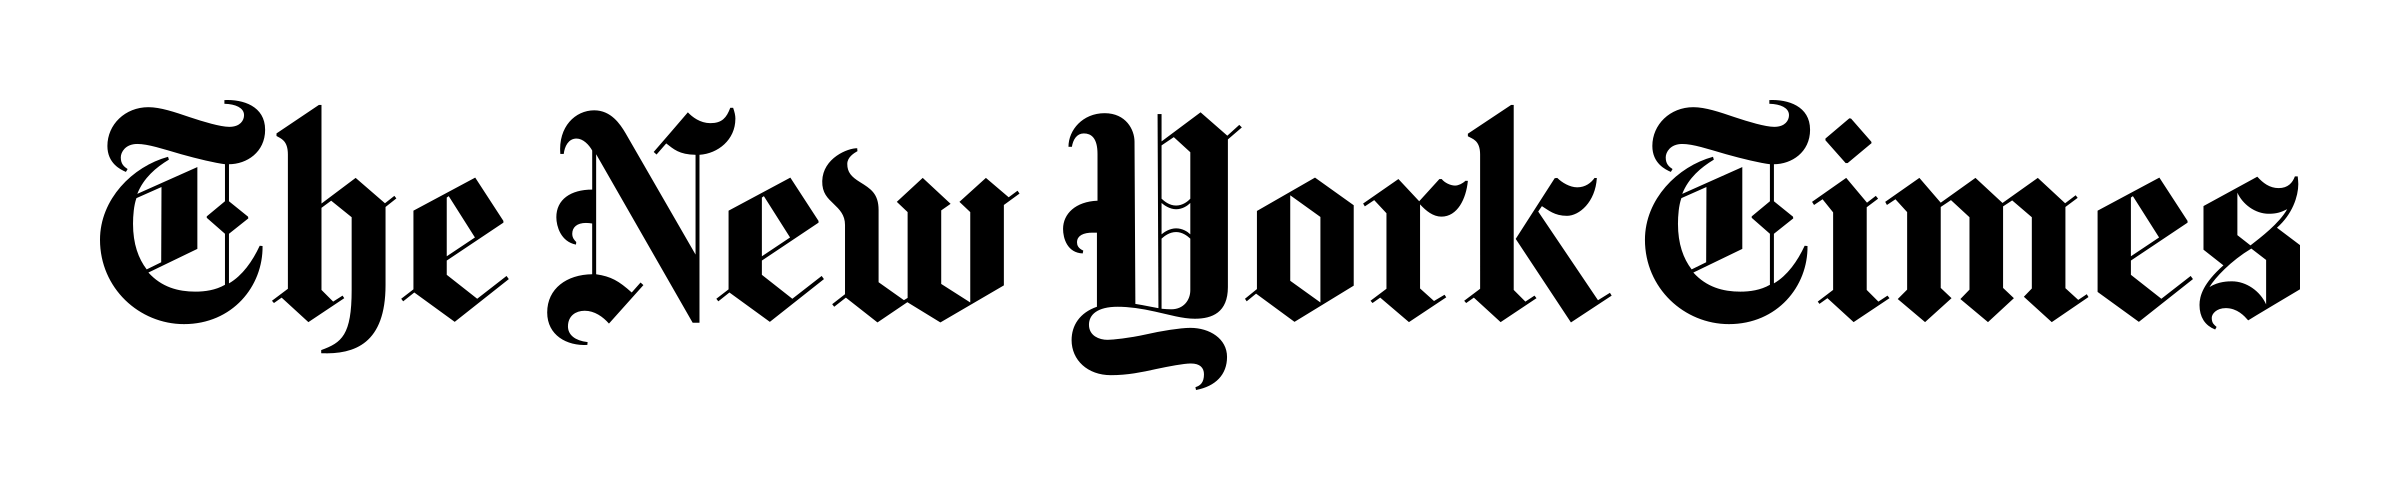 Logo du New Yort Times